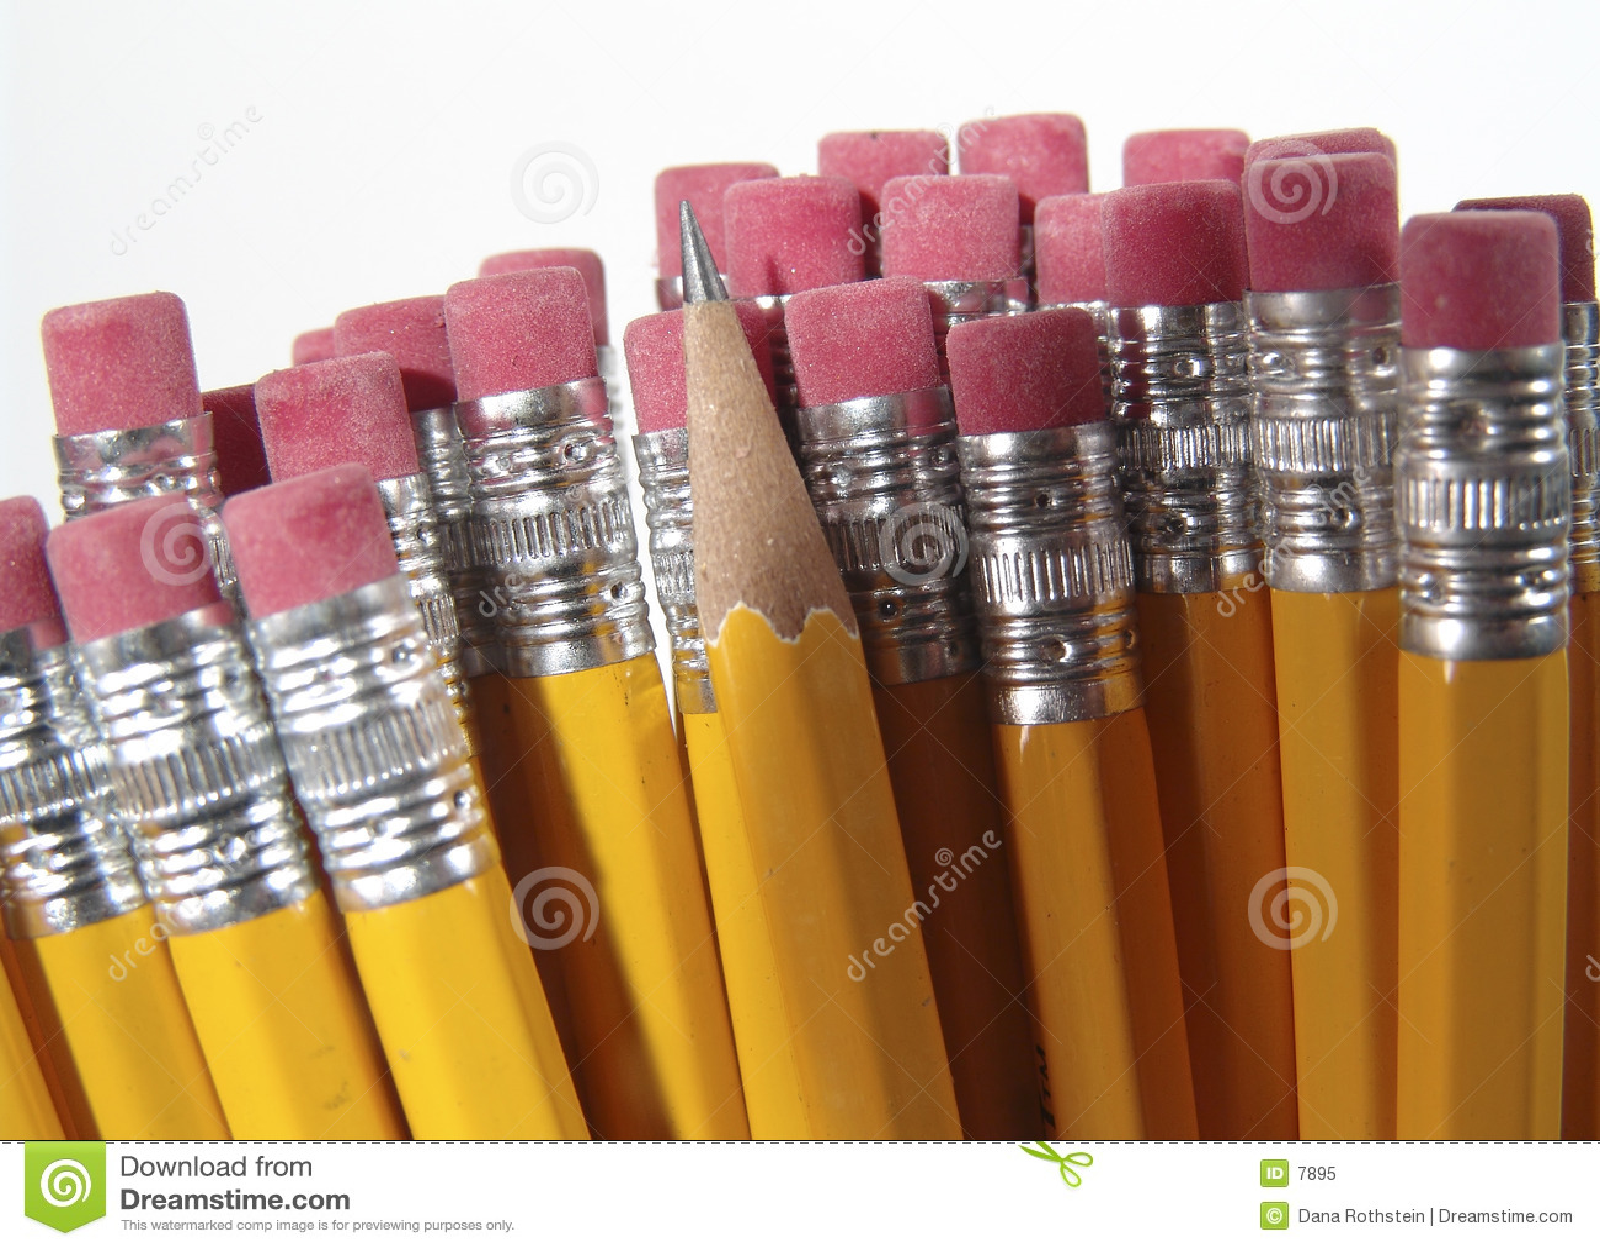 Eliminadores de lápis